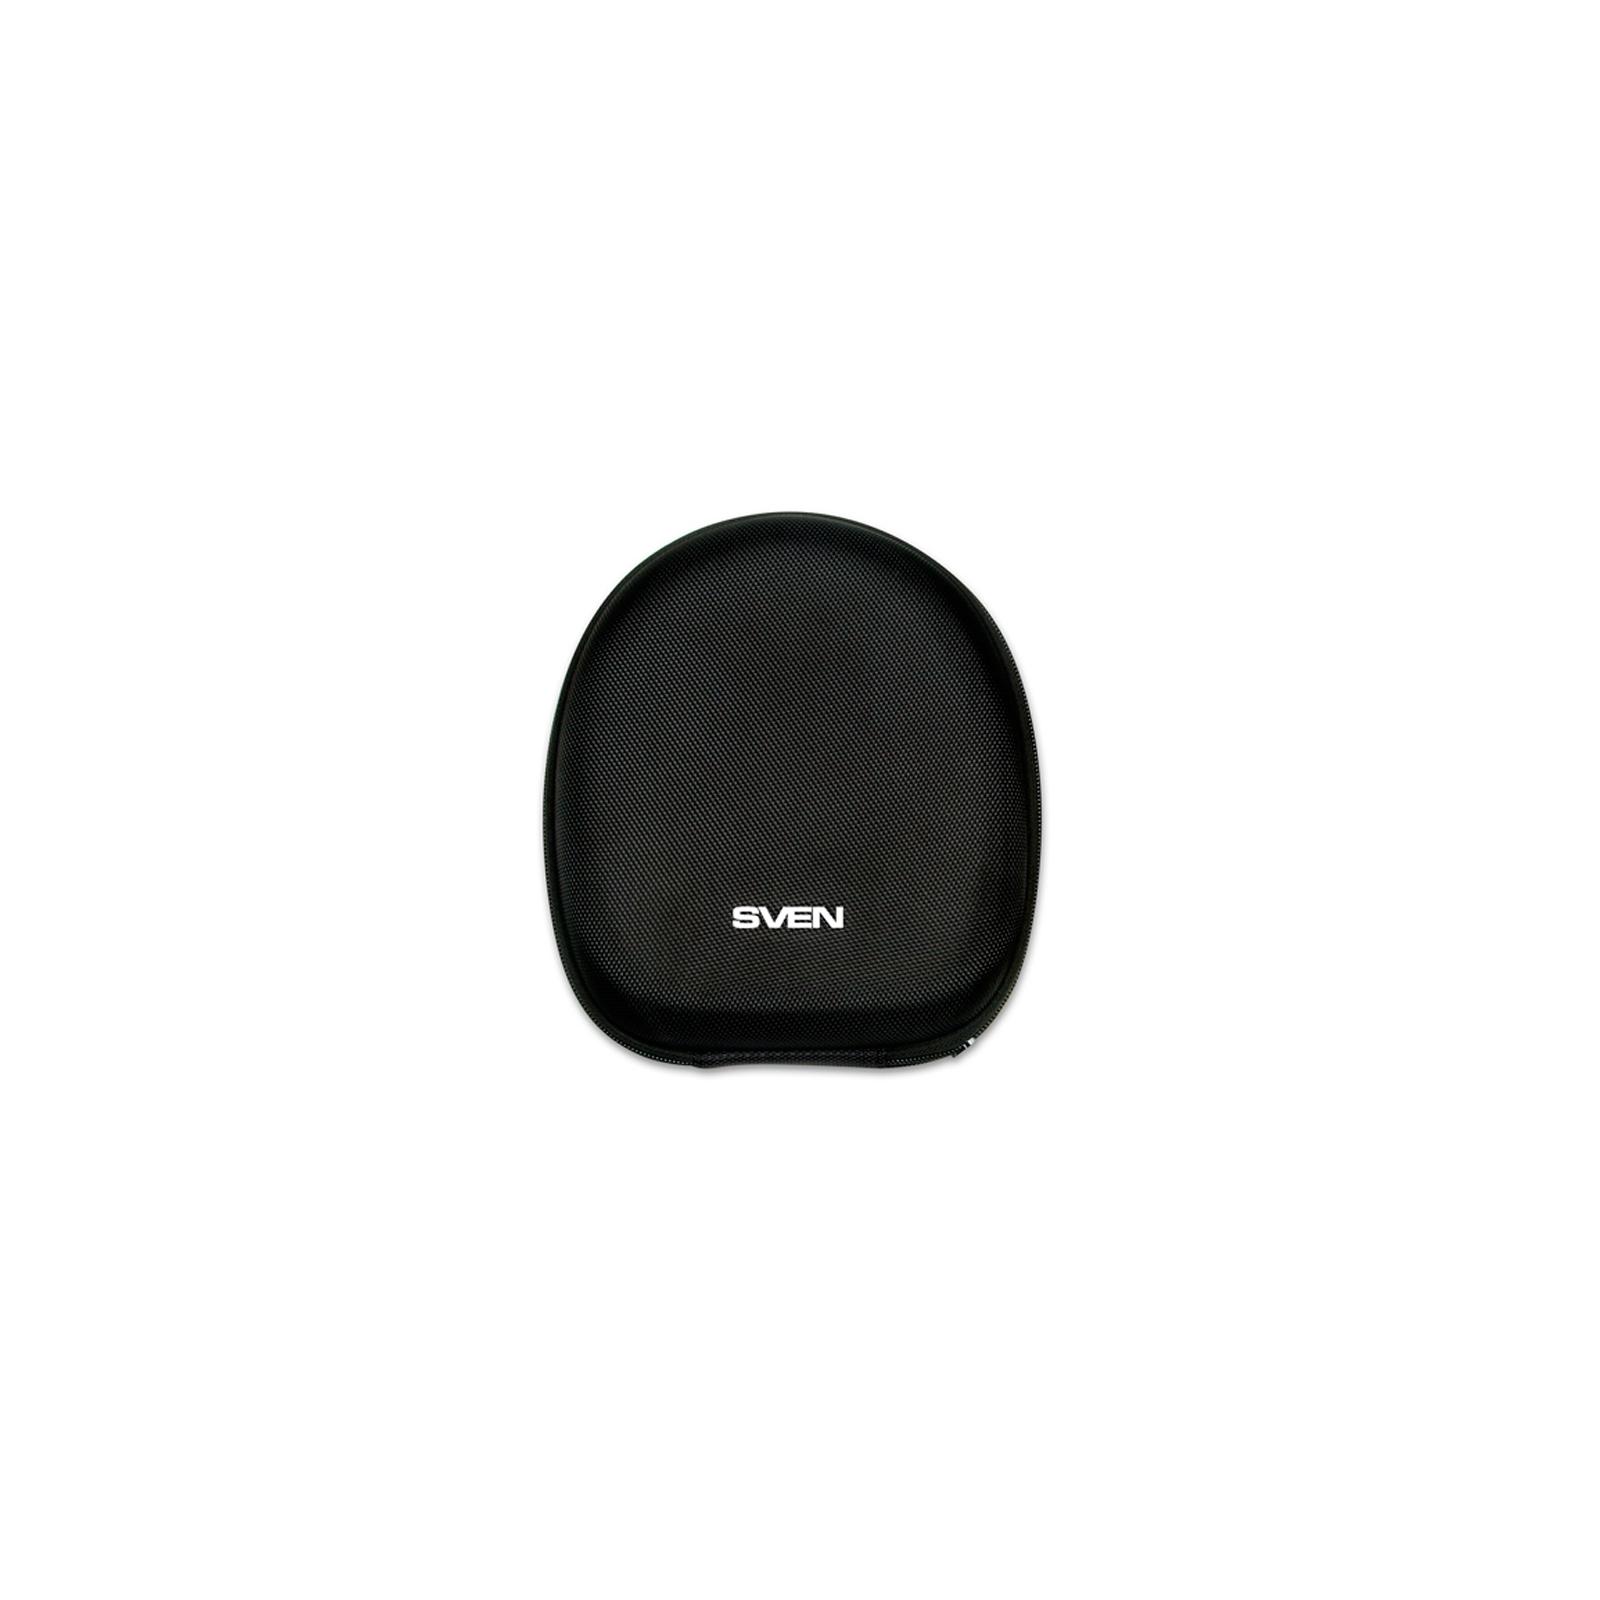 Наушники Sven AP-B900MV Black Bluetooth (AP-B900MV black) изображение 8